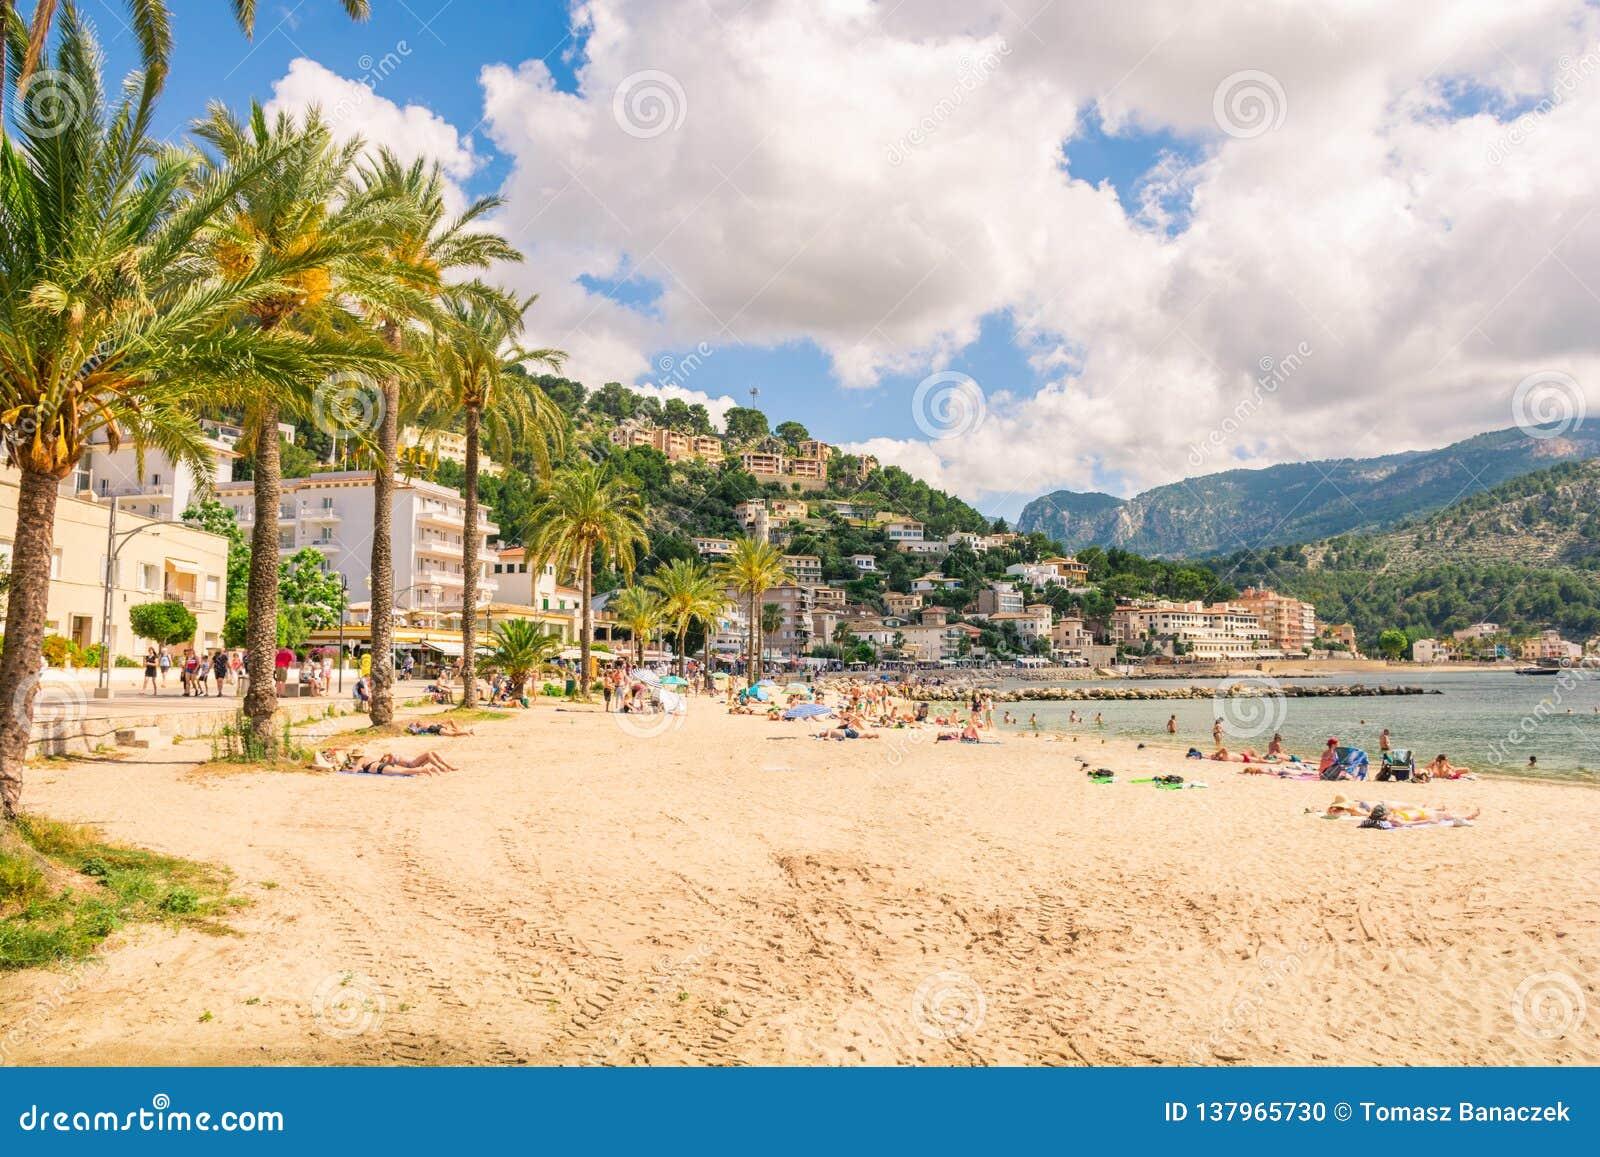 Beautiful Port de Soller in Mallorca.